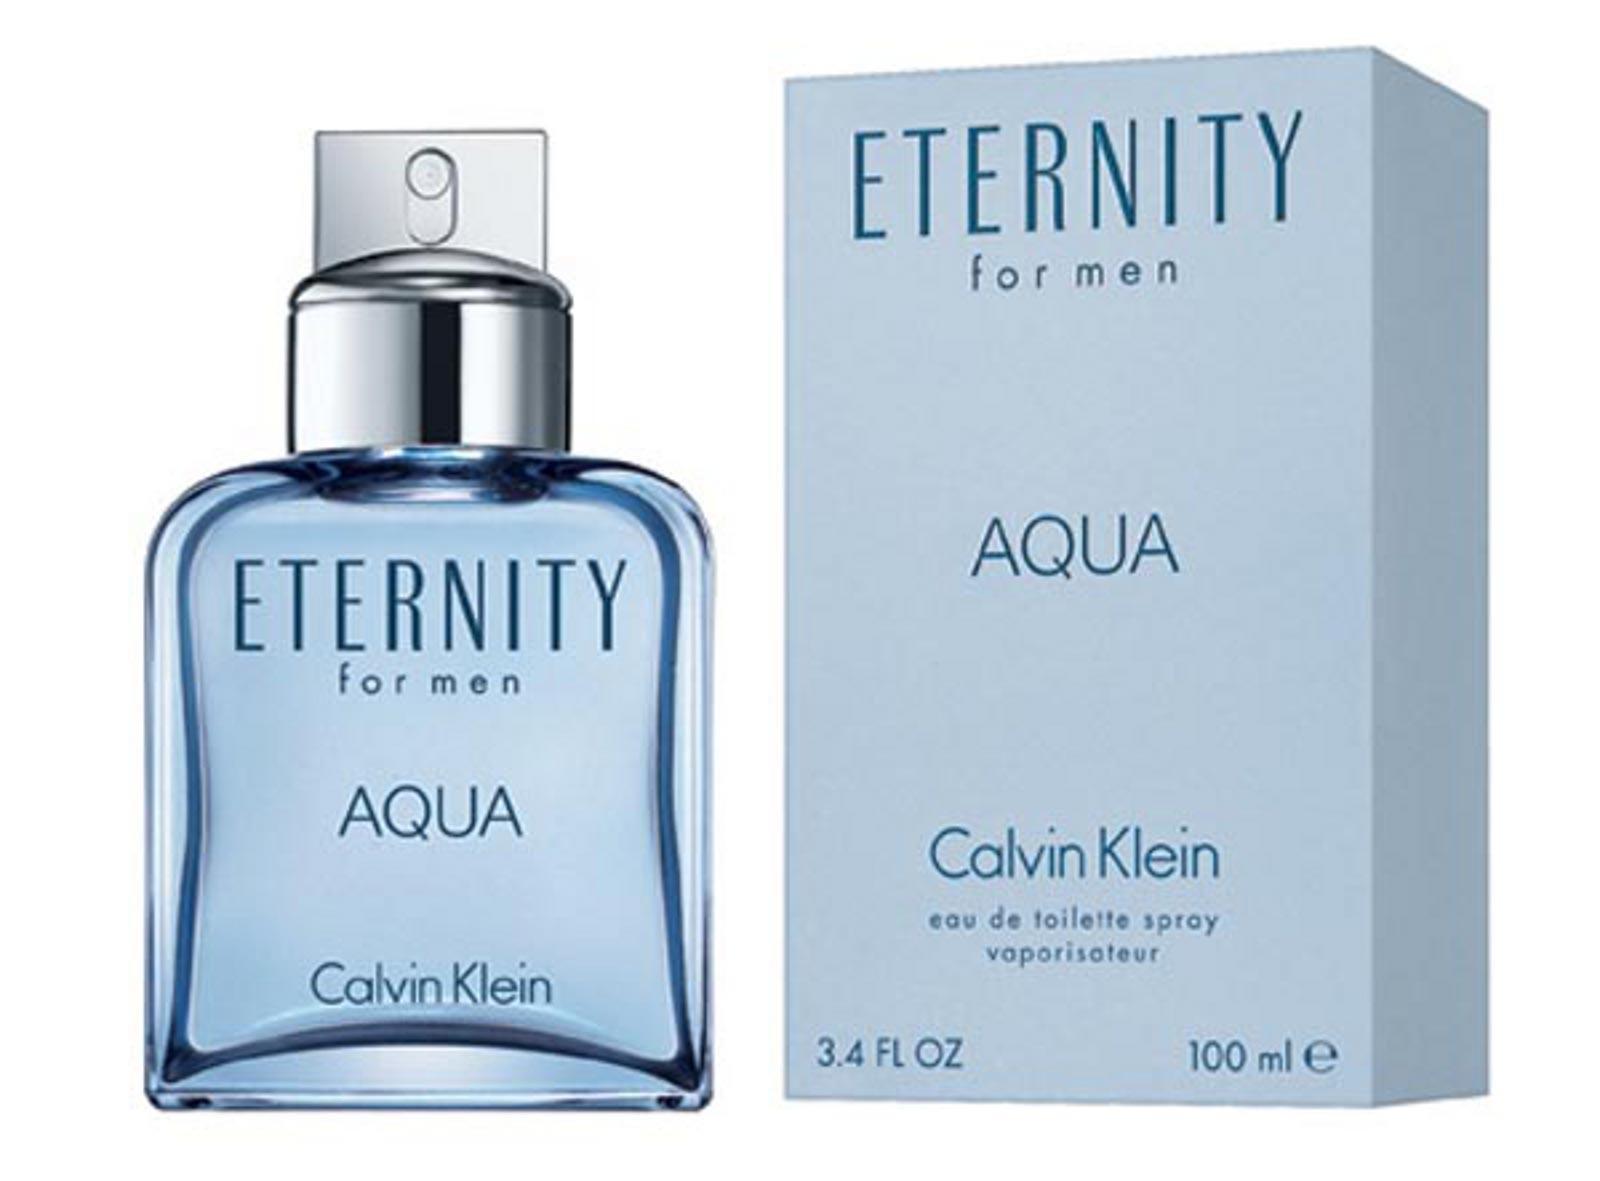 Calvin Klein Eternity for Men Aqua аромат для мужчин